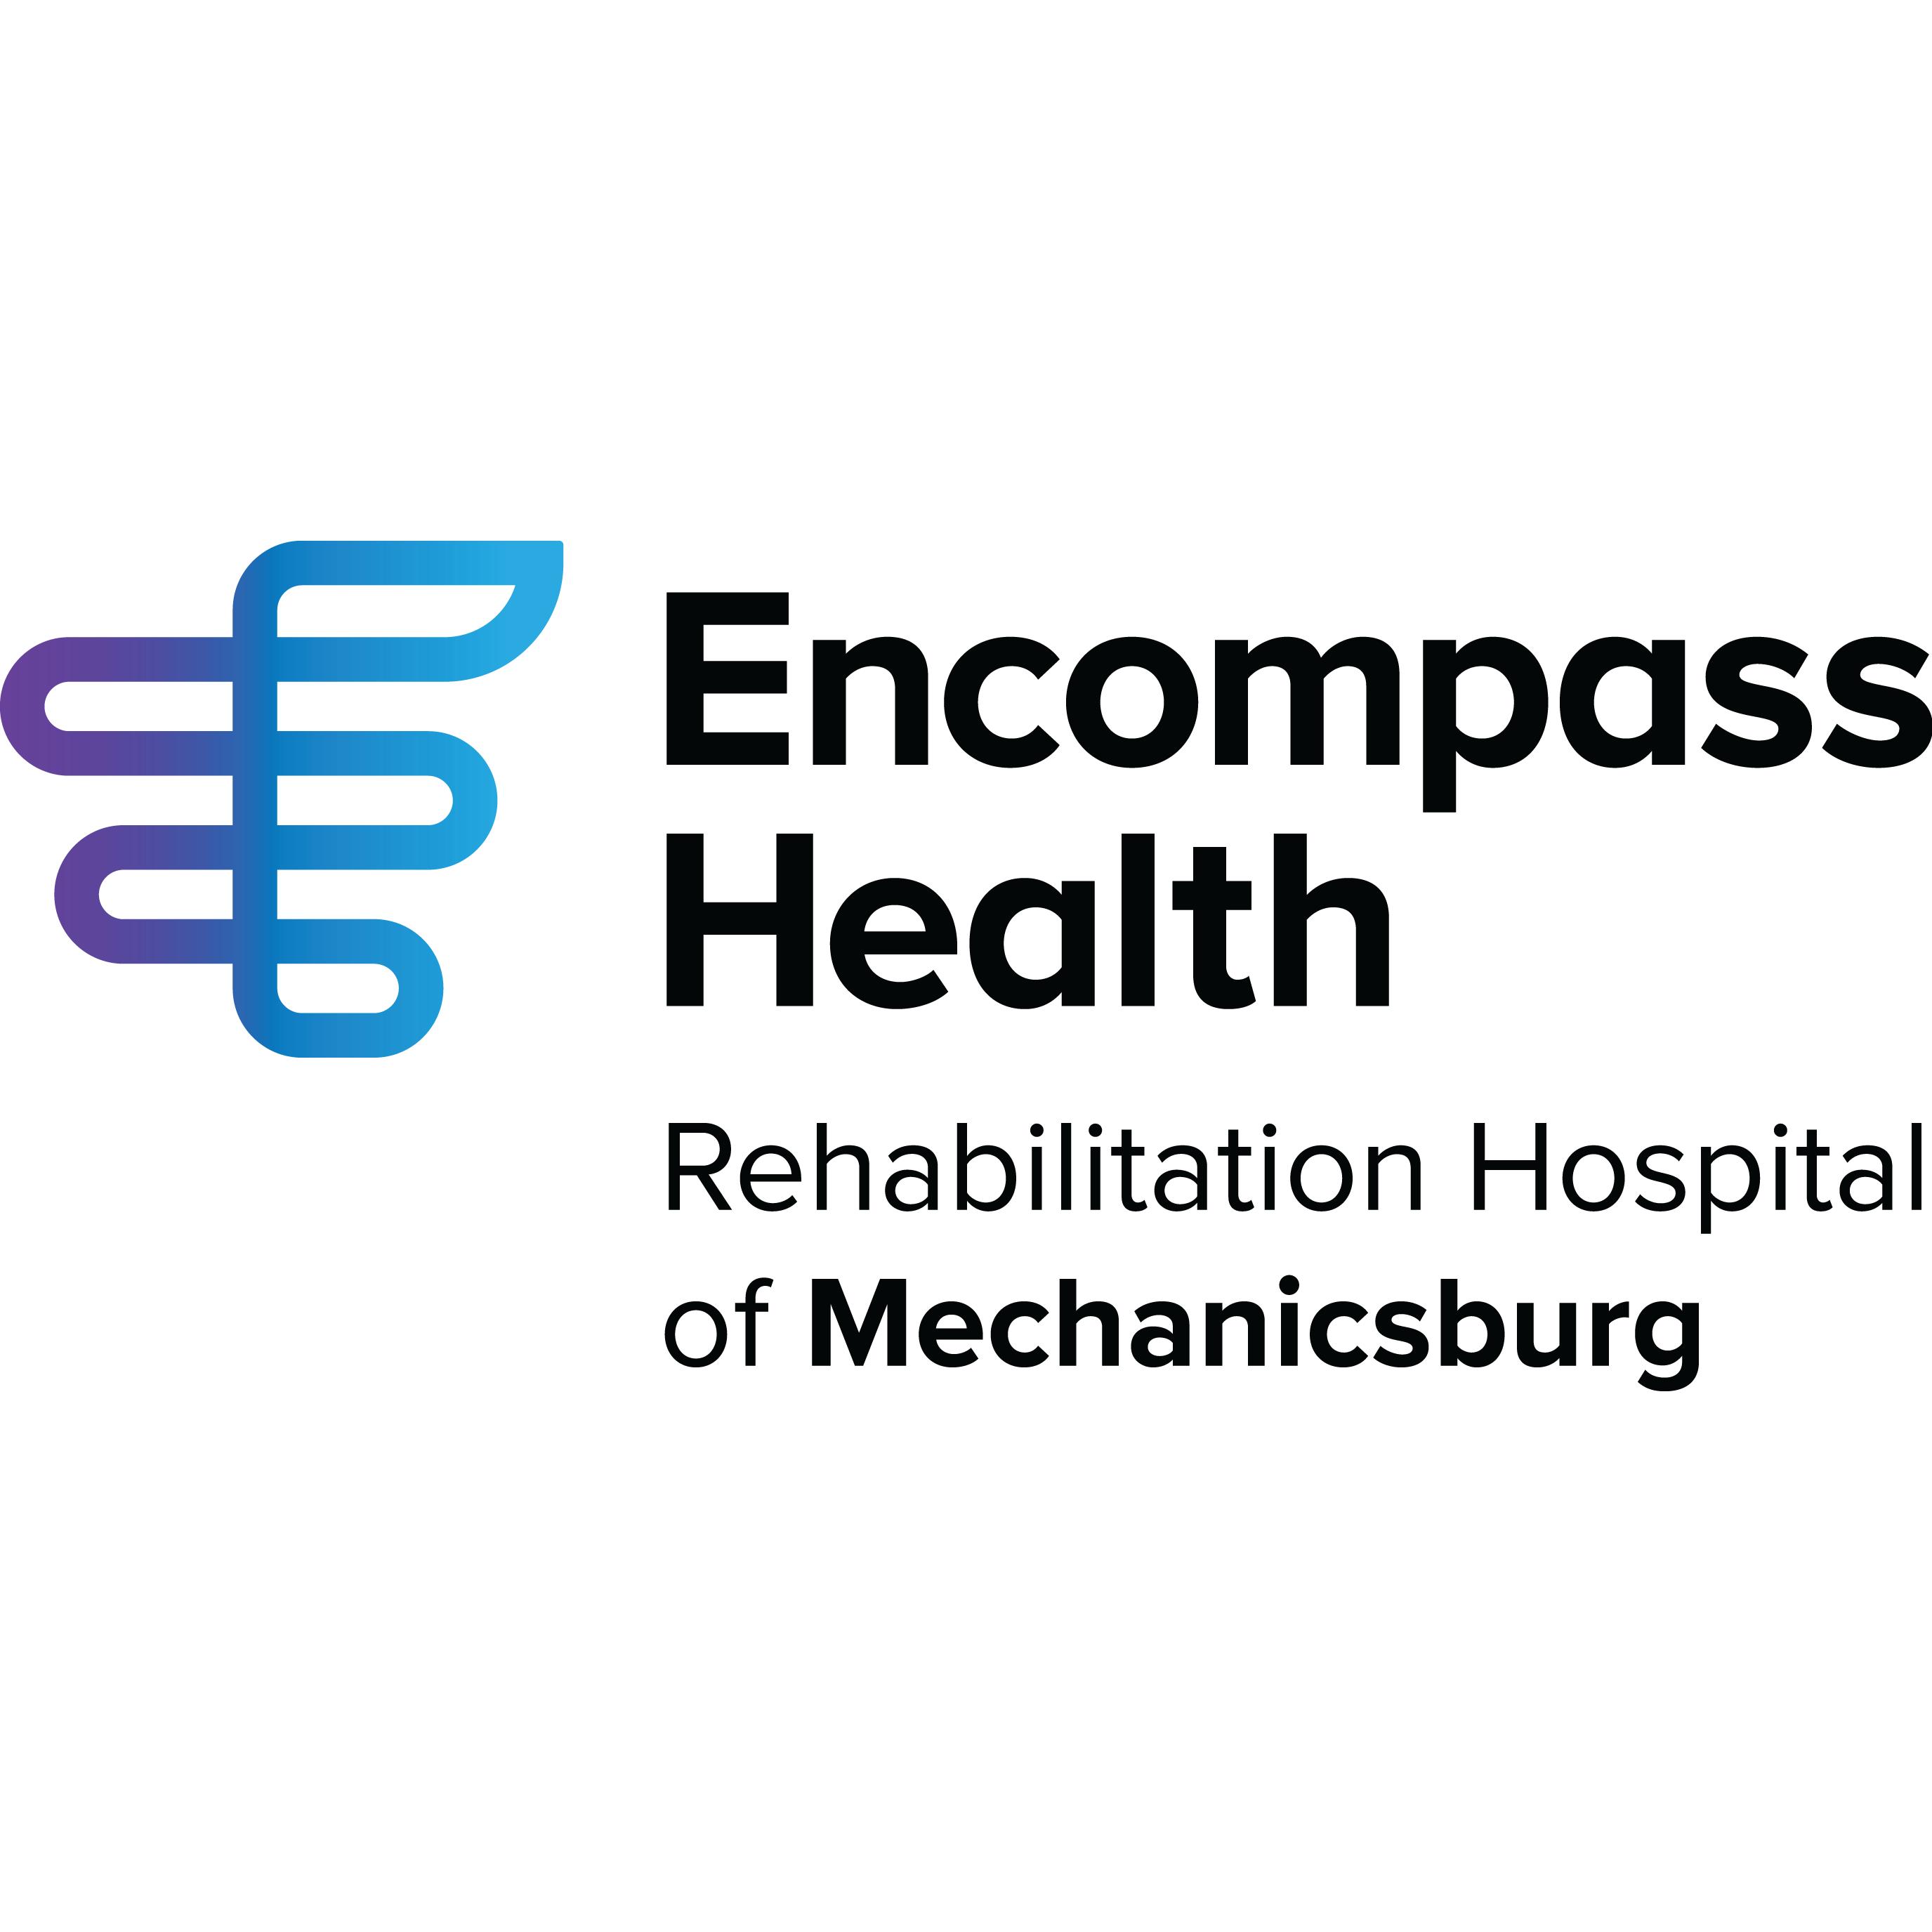 Encompass Health Rehabilitation Hospital of Mechanicsburg